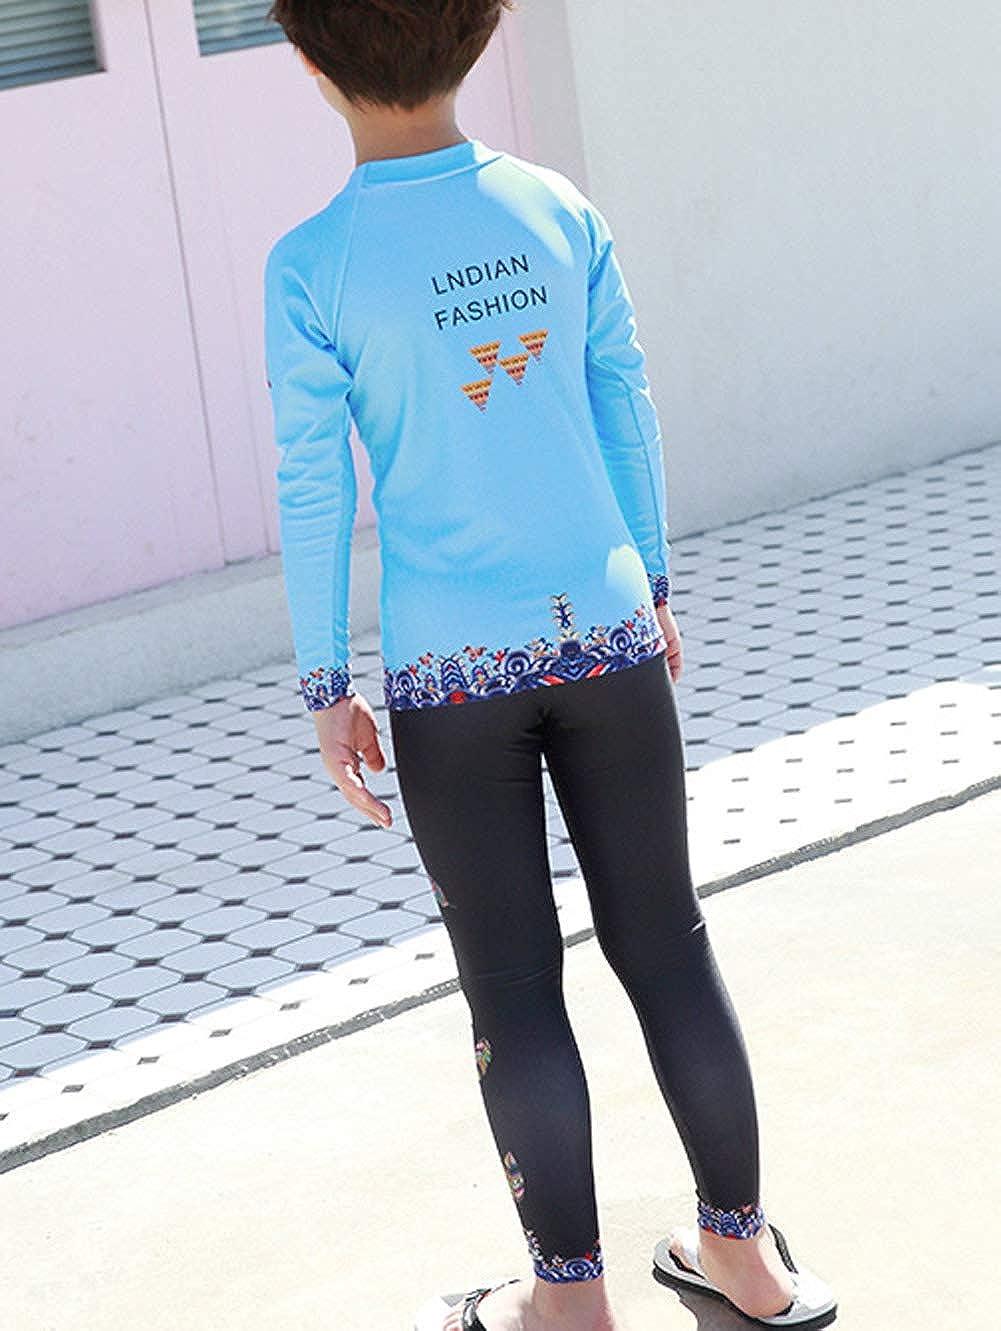 Happy Cherry Kids Rashruard Swimsuit Long Sleeve Sun Protection Wetsuit 5-9T